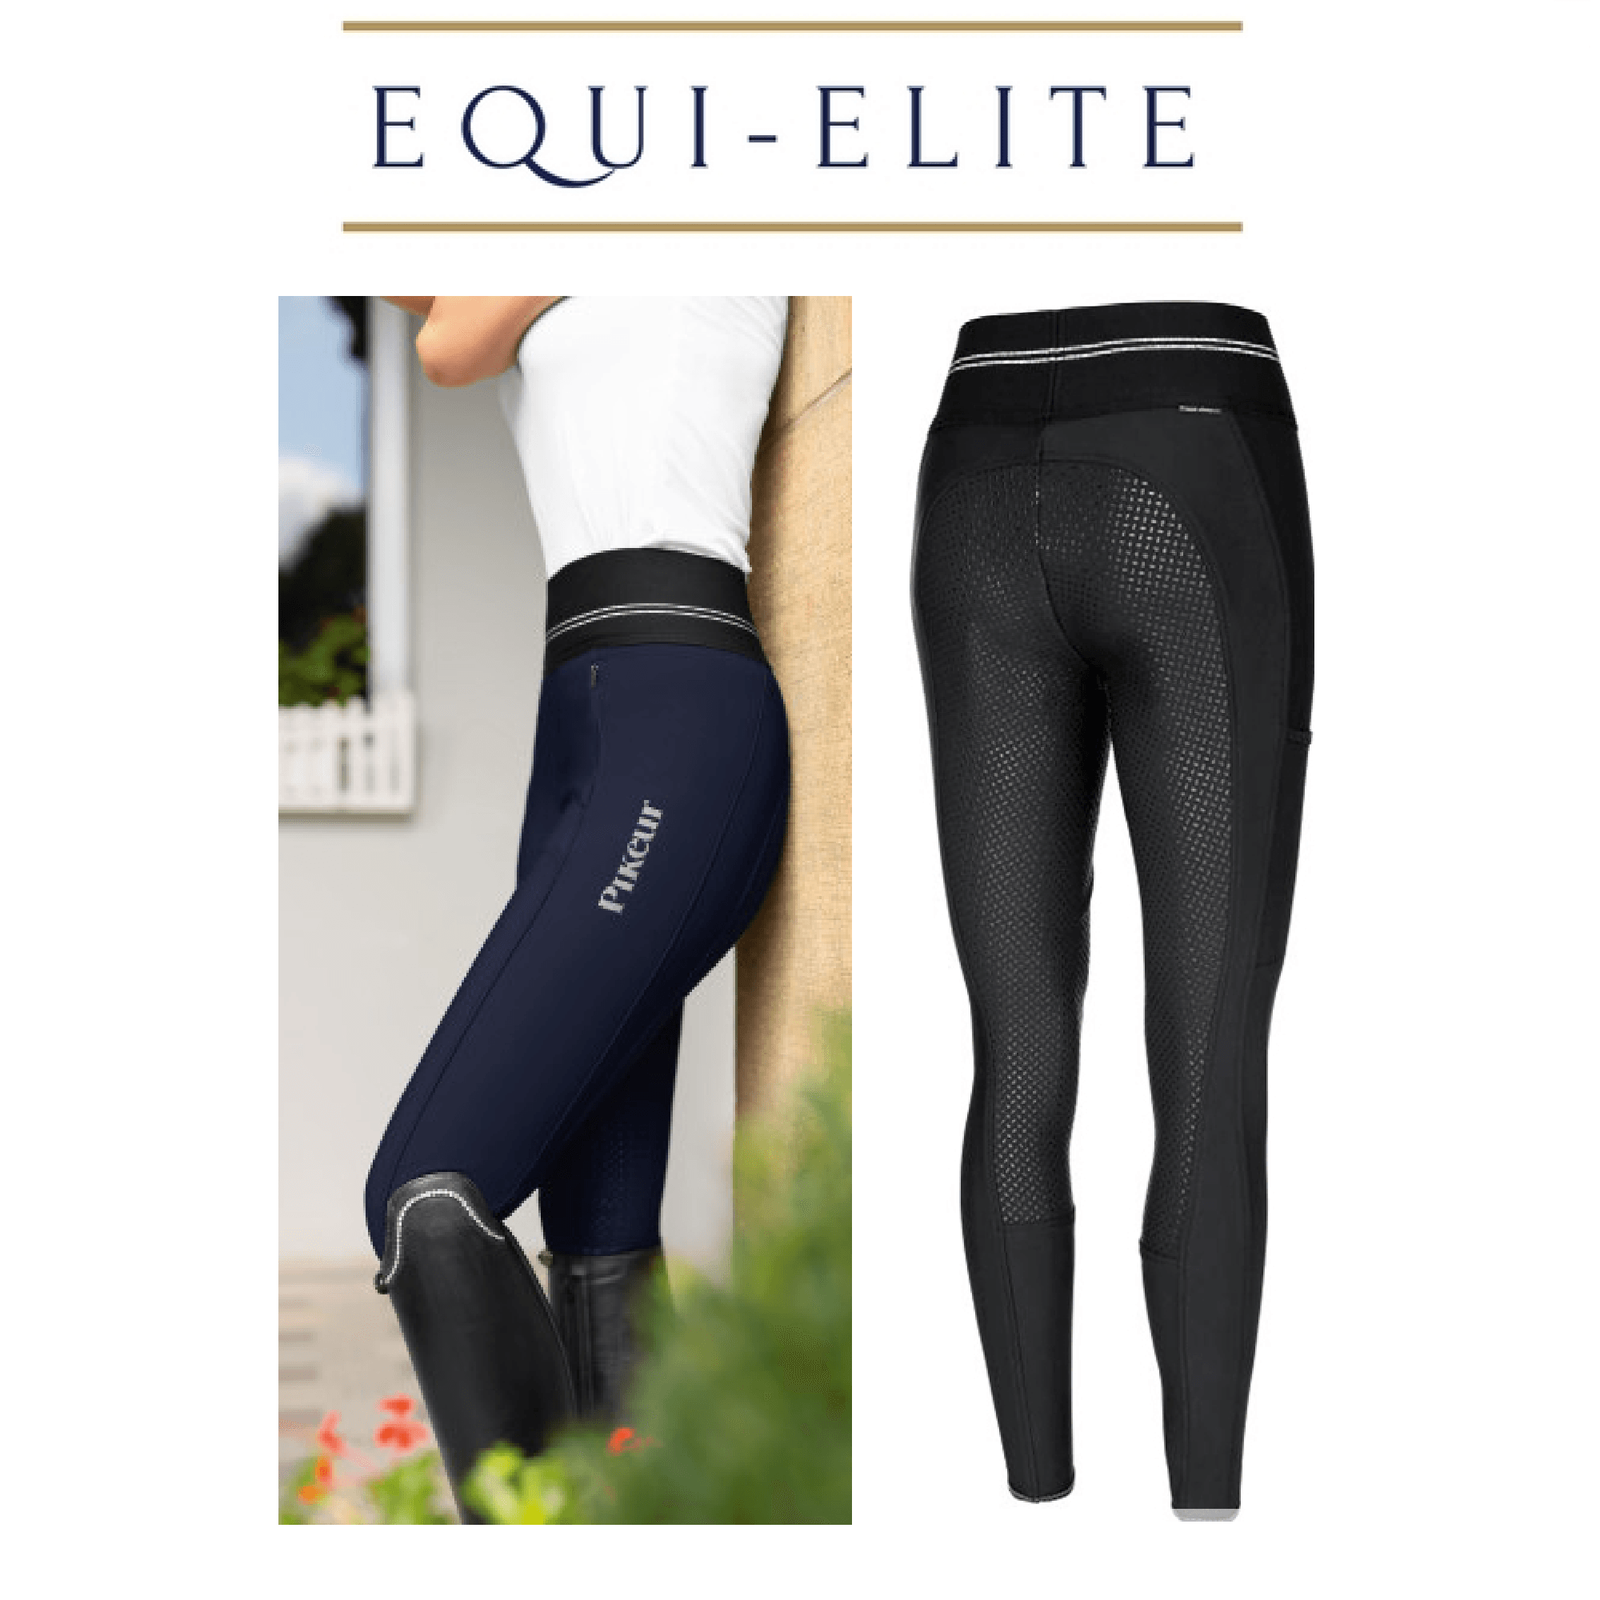 Pikeur GIA Grip athleisure Inverno Softshell PantaloniPull On A CAVALLO Collant